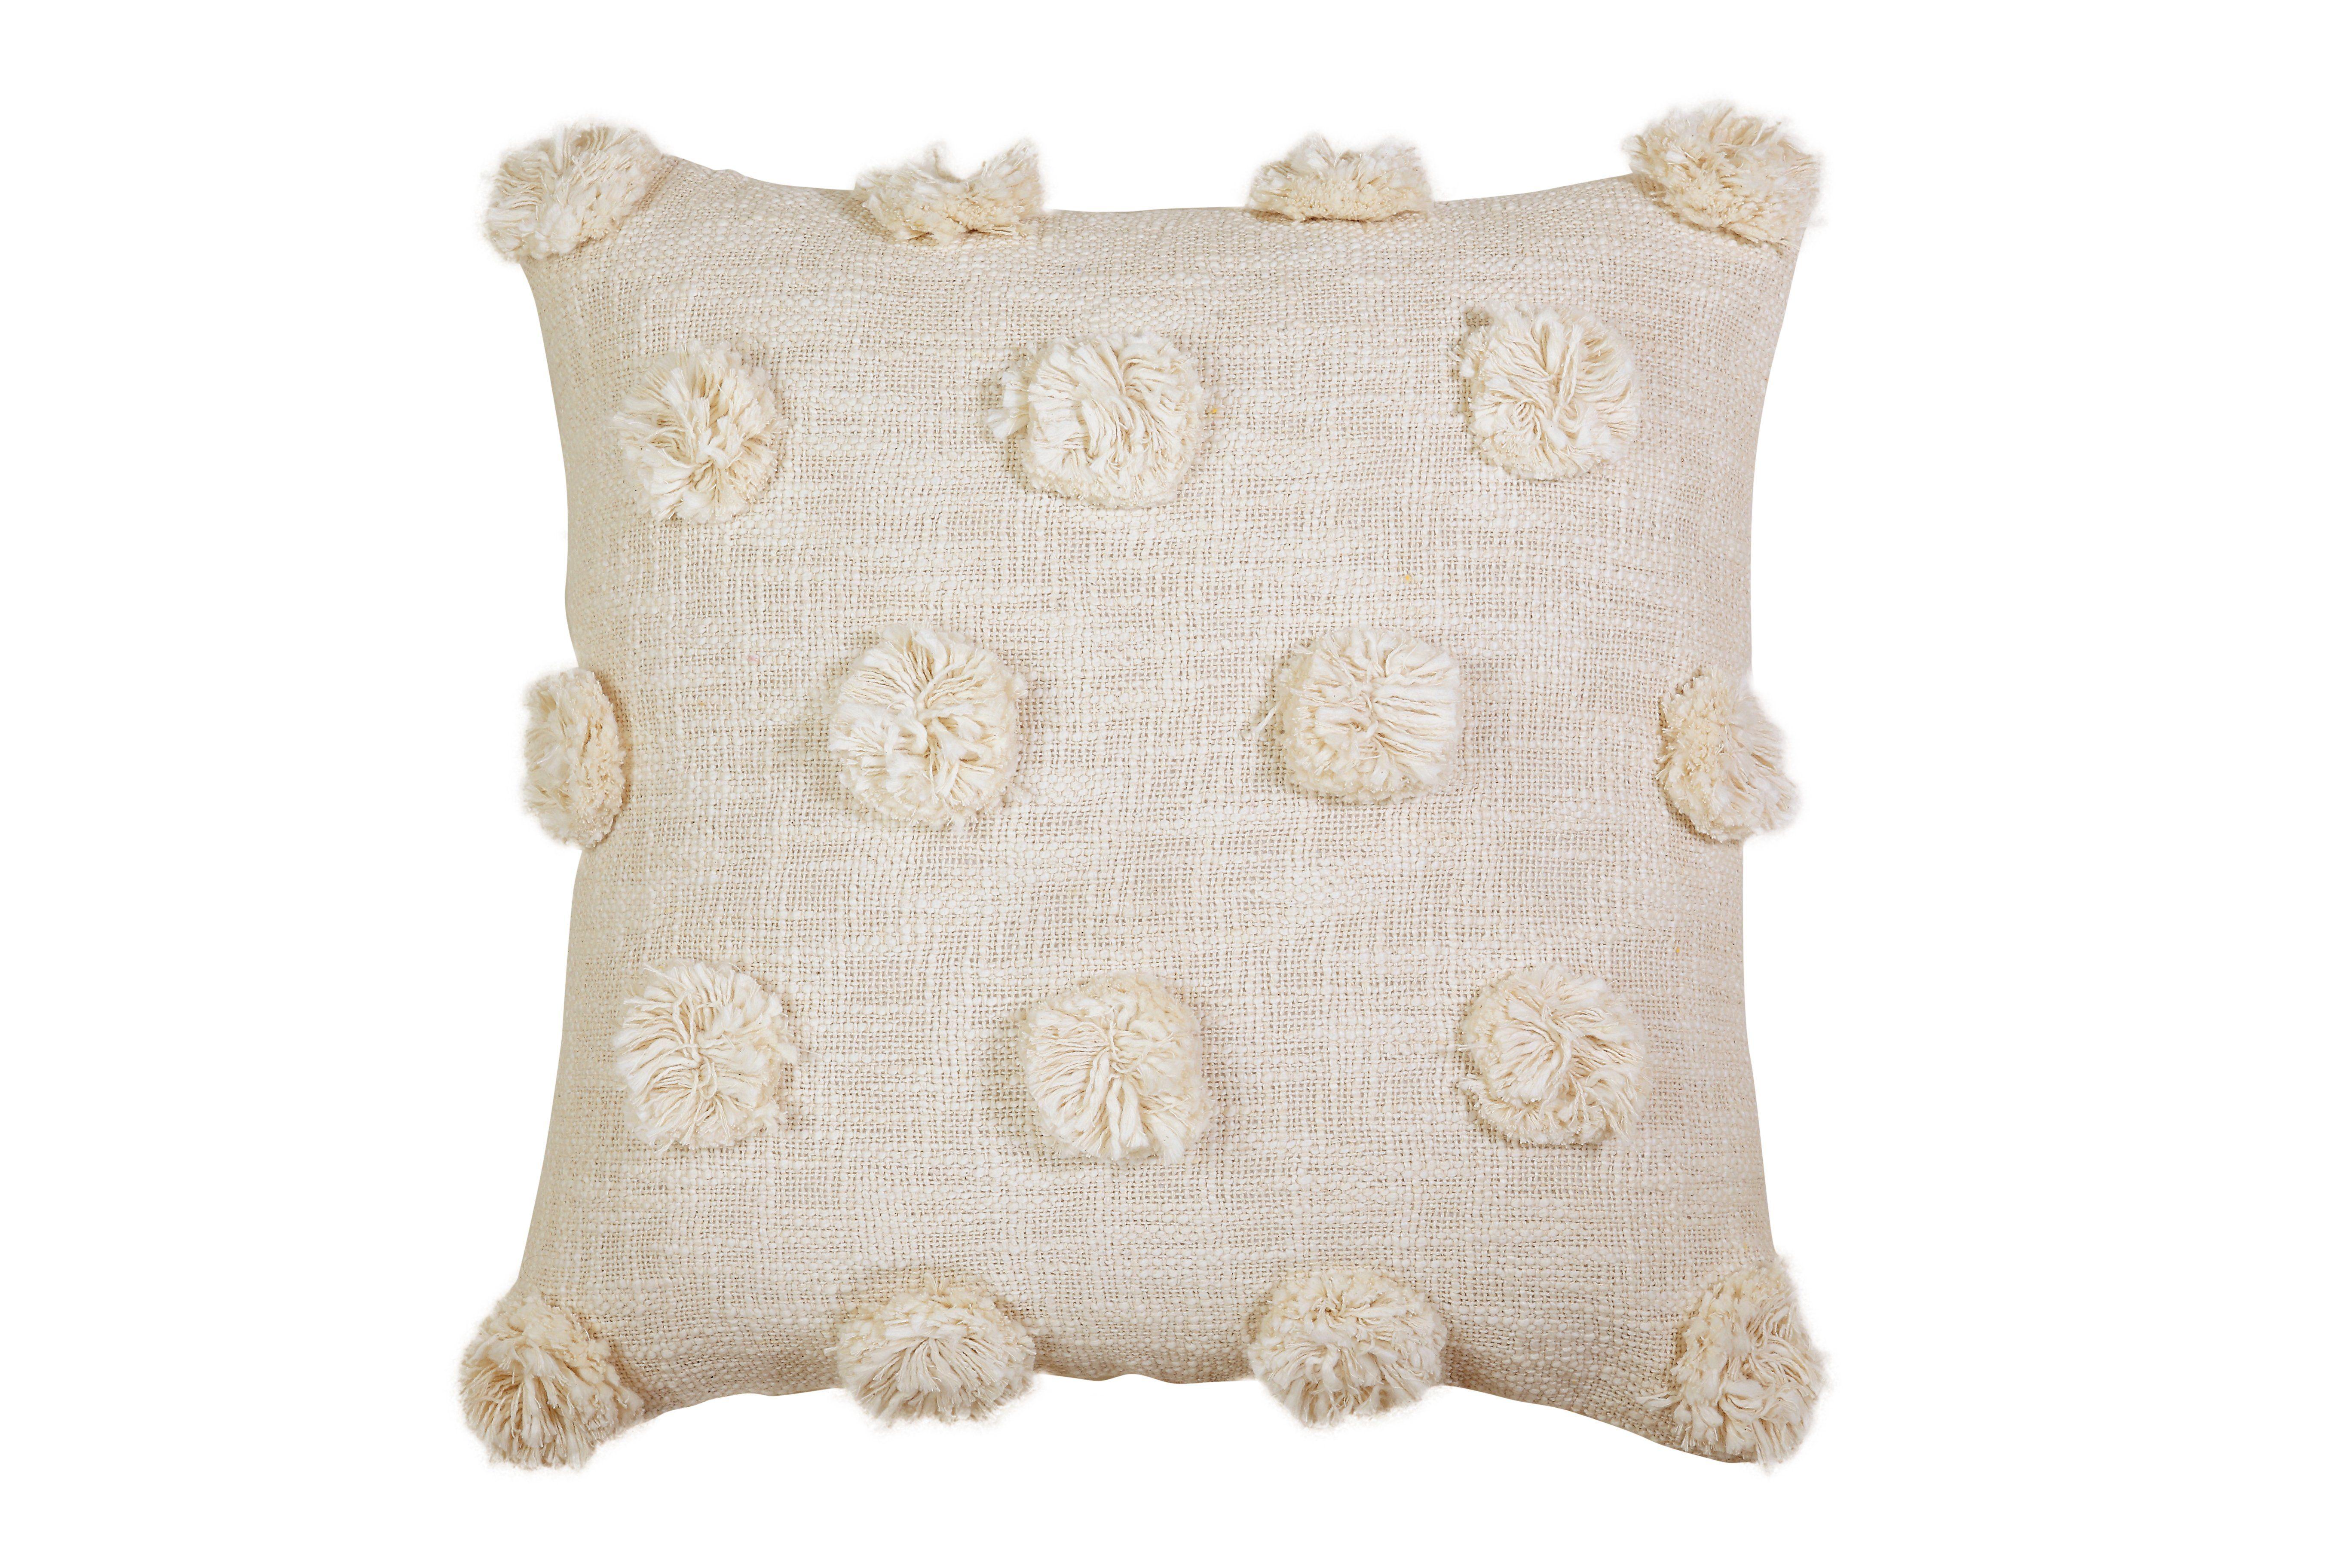 mia pom pom cushion natural offwhite 17x17 inch pompom cushion pom pom pillows colorful pillows